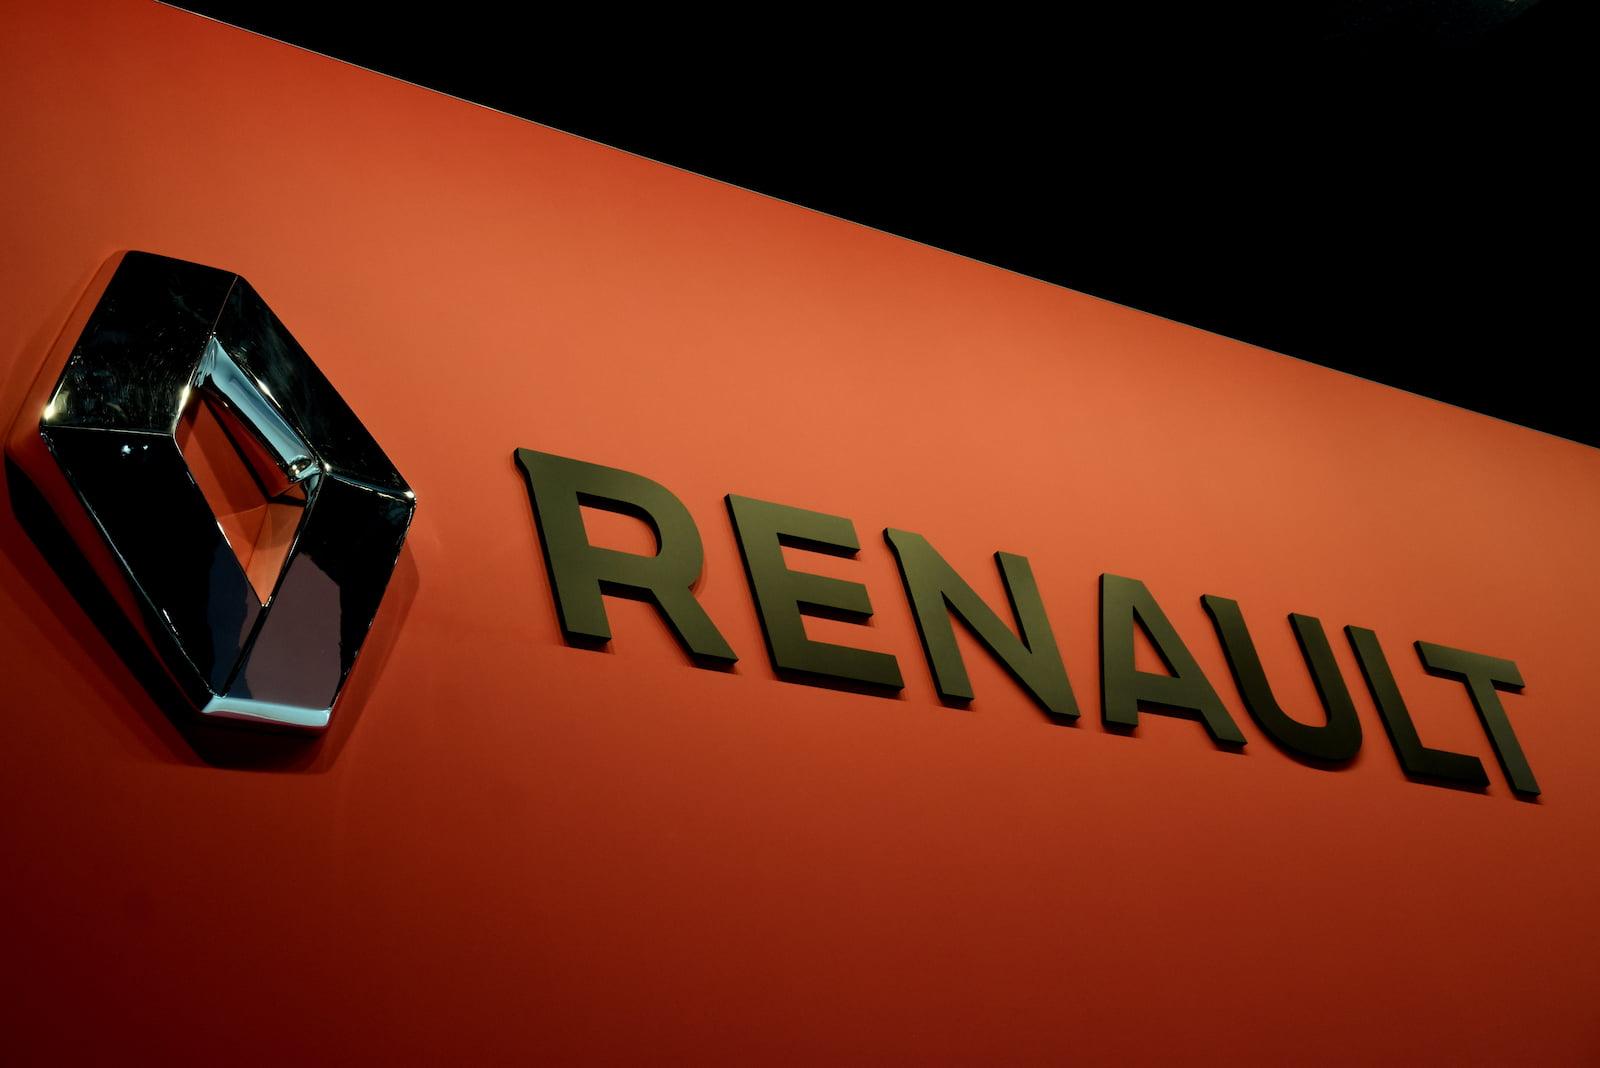 A Renault logo